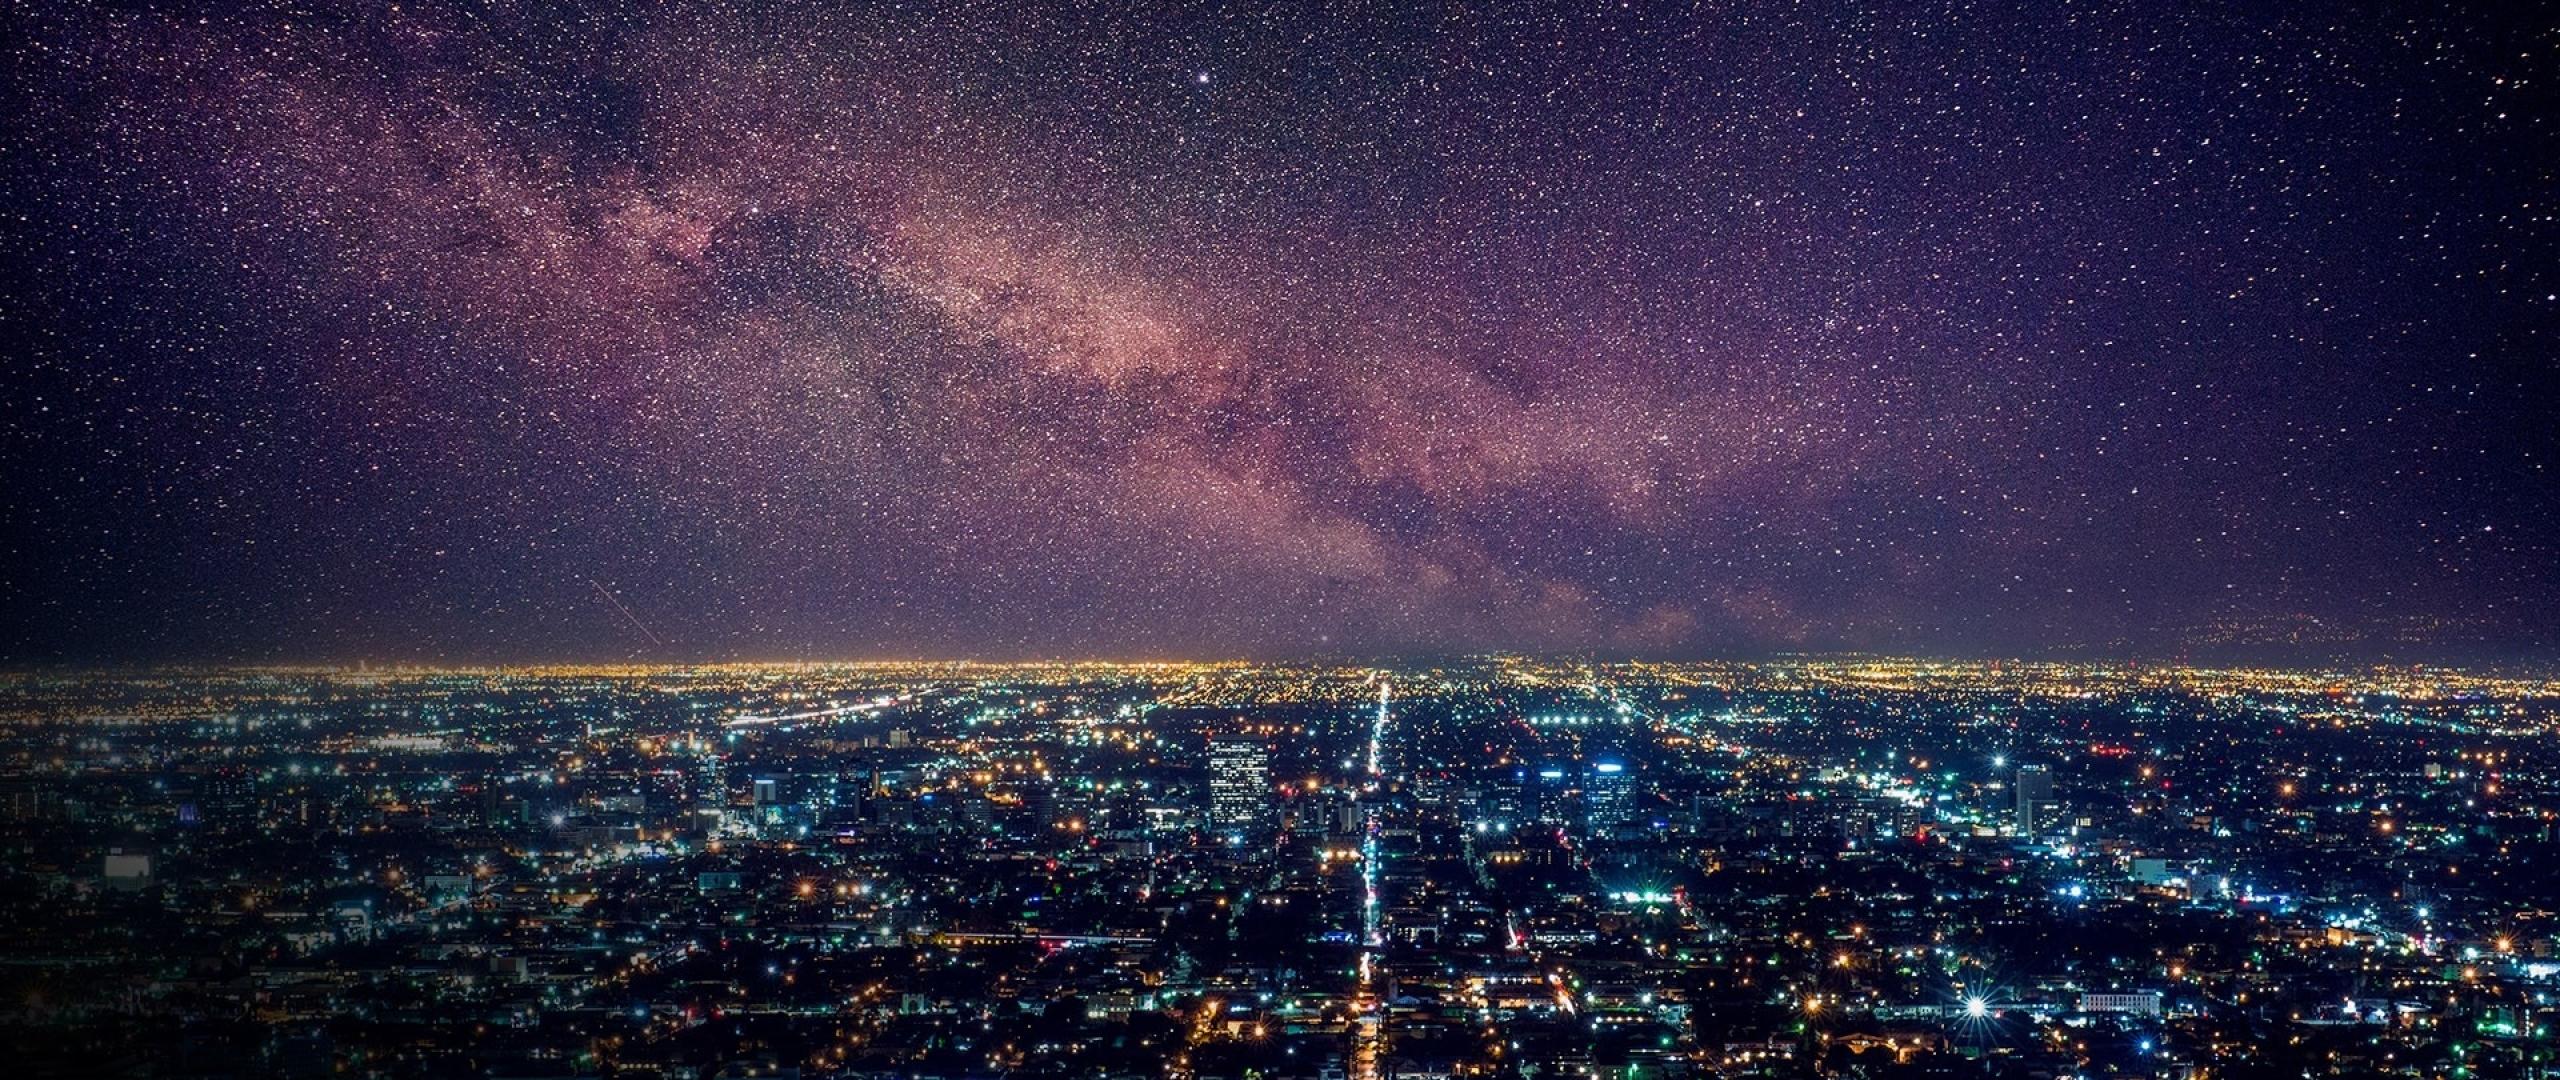 2560x1080 Los Angeles Starry Night 2560x1080 Resolution ...